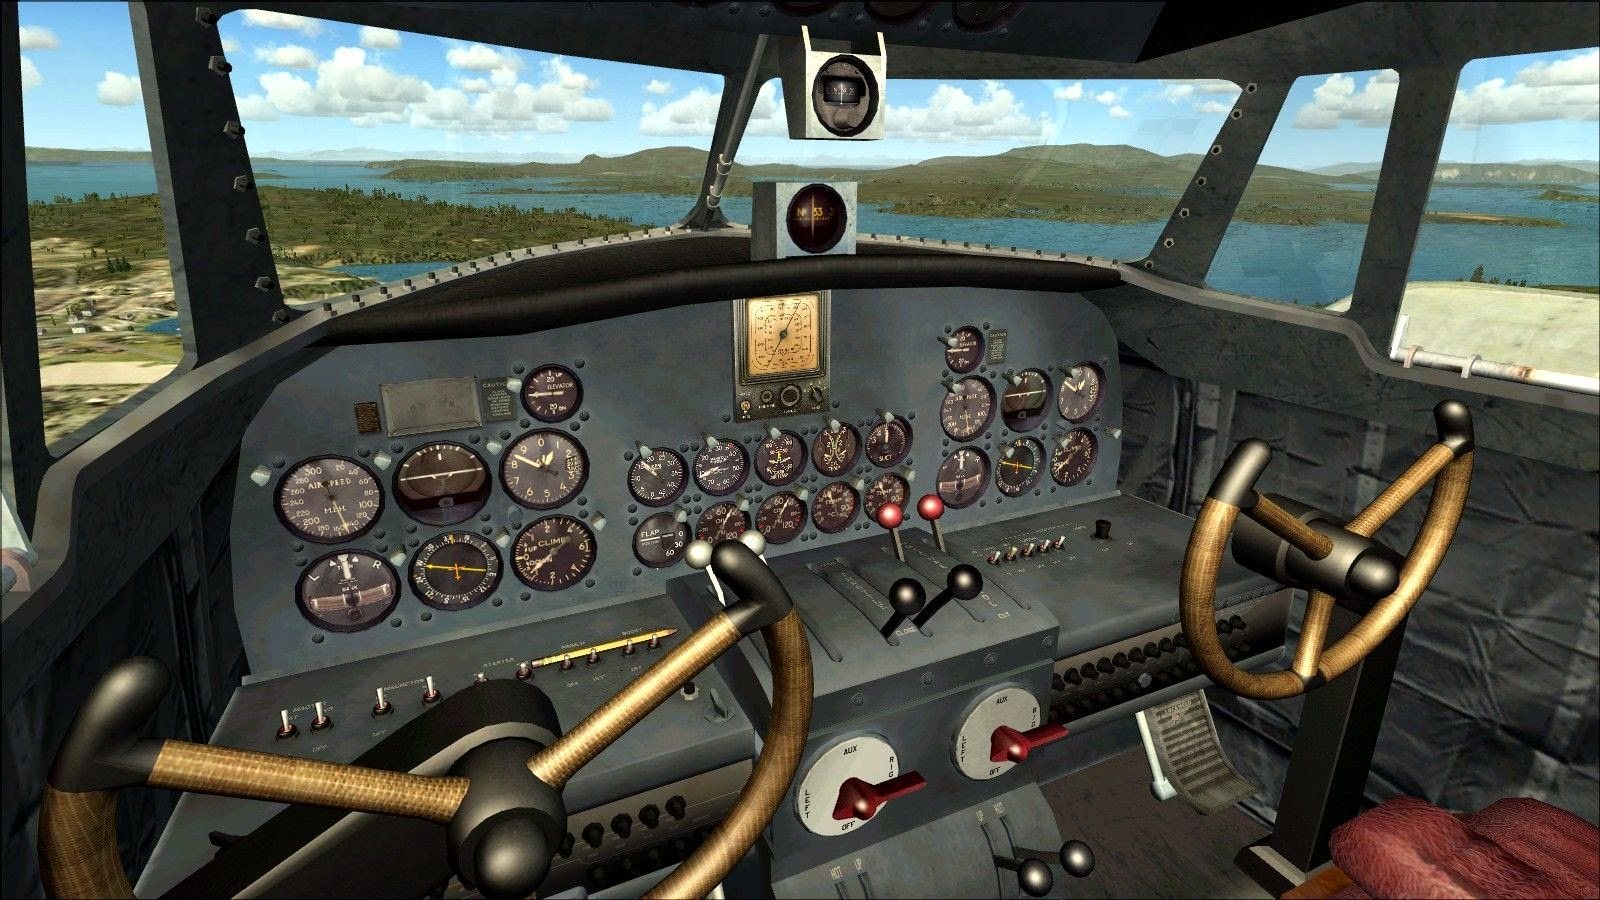 Microsoft flight simulator video card